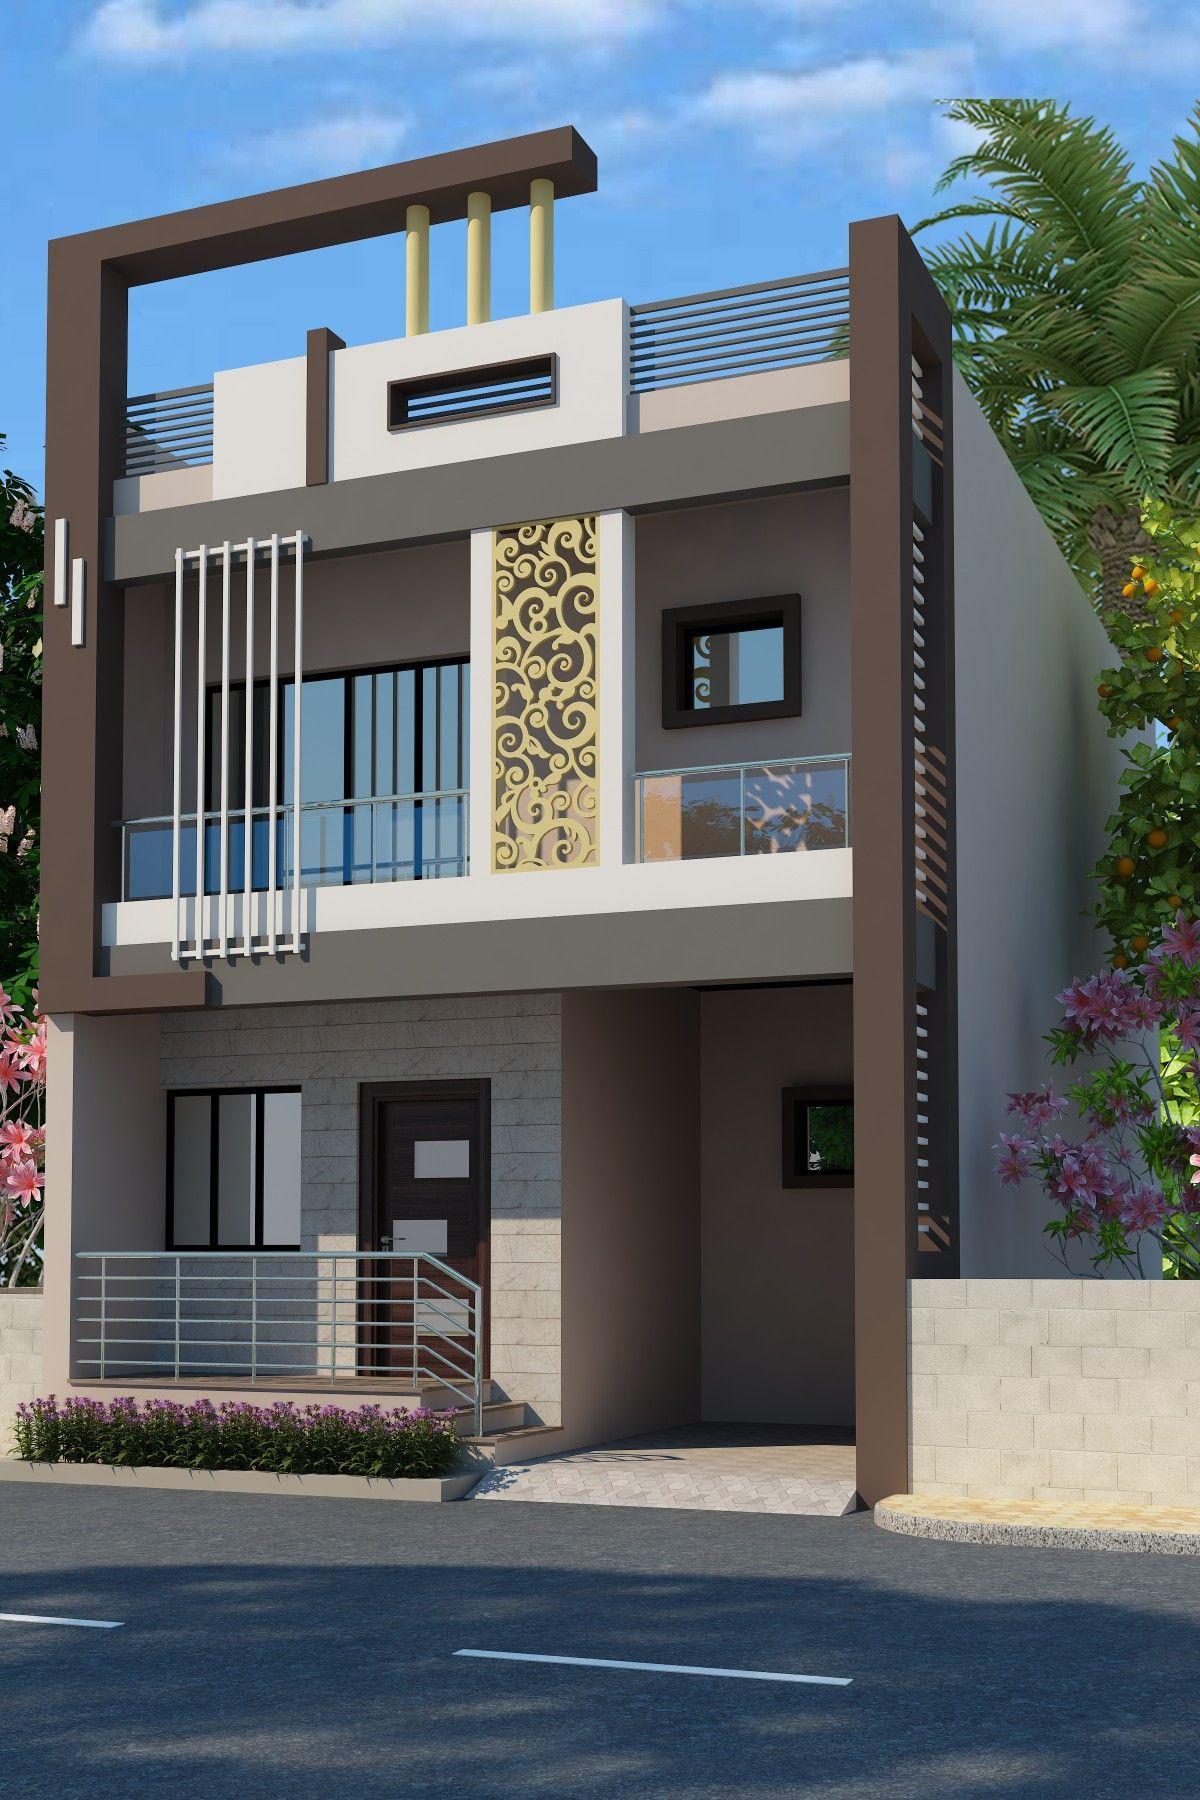 New Design In 2019 Minimalist House Design Bungalow Newsign In 2019 Bungalow Housesi In 2020 Small House Elevation Design Modern Minimalist House Duplex House Design